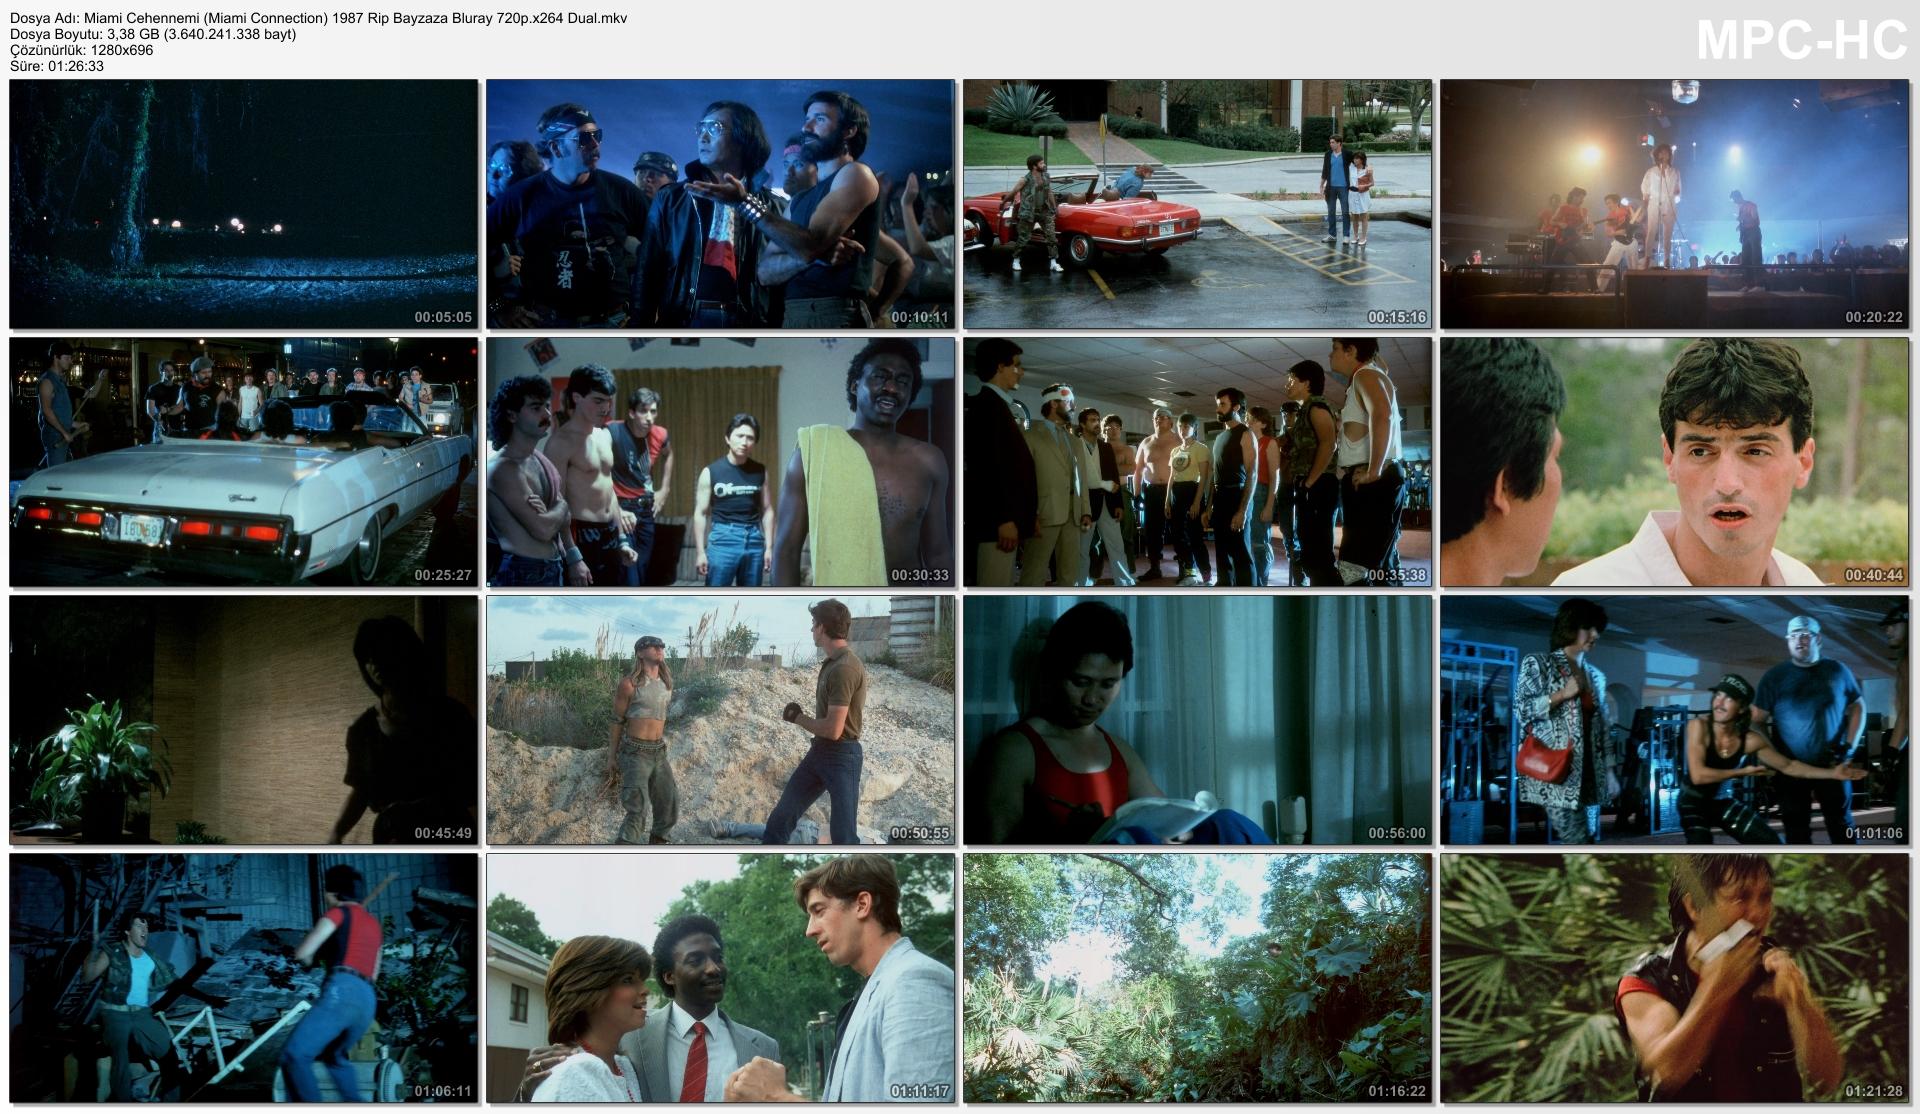 Miami Cehennemi (Miami Connection) 1987 Rip Bayzaza Bluray 720p.x264 Dual.mkv_thumbs_[2017.01.11_16 - bayzaza